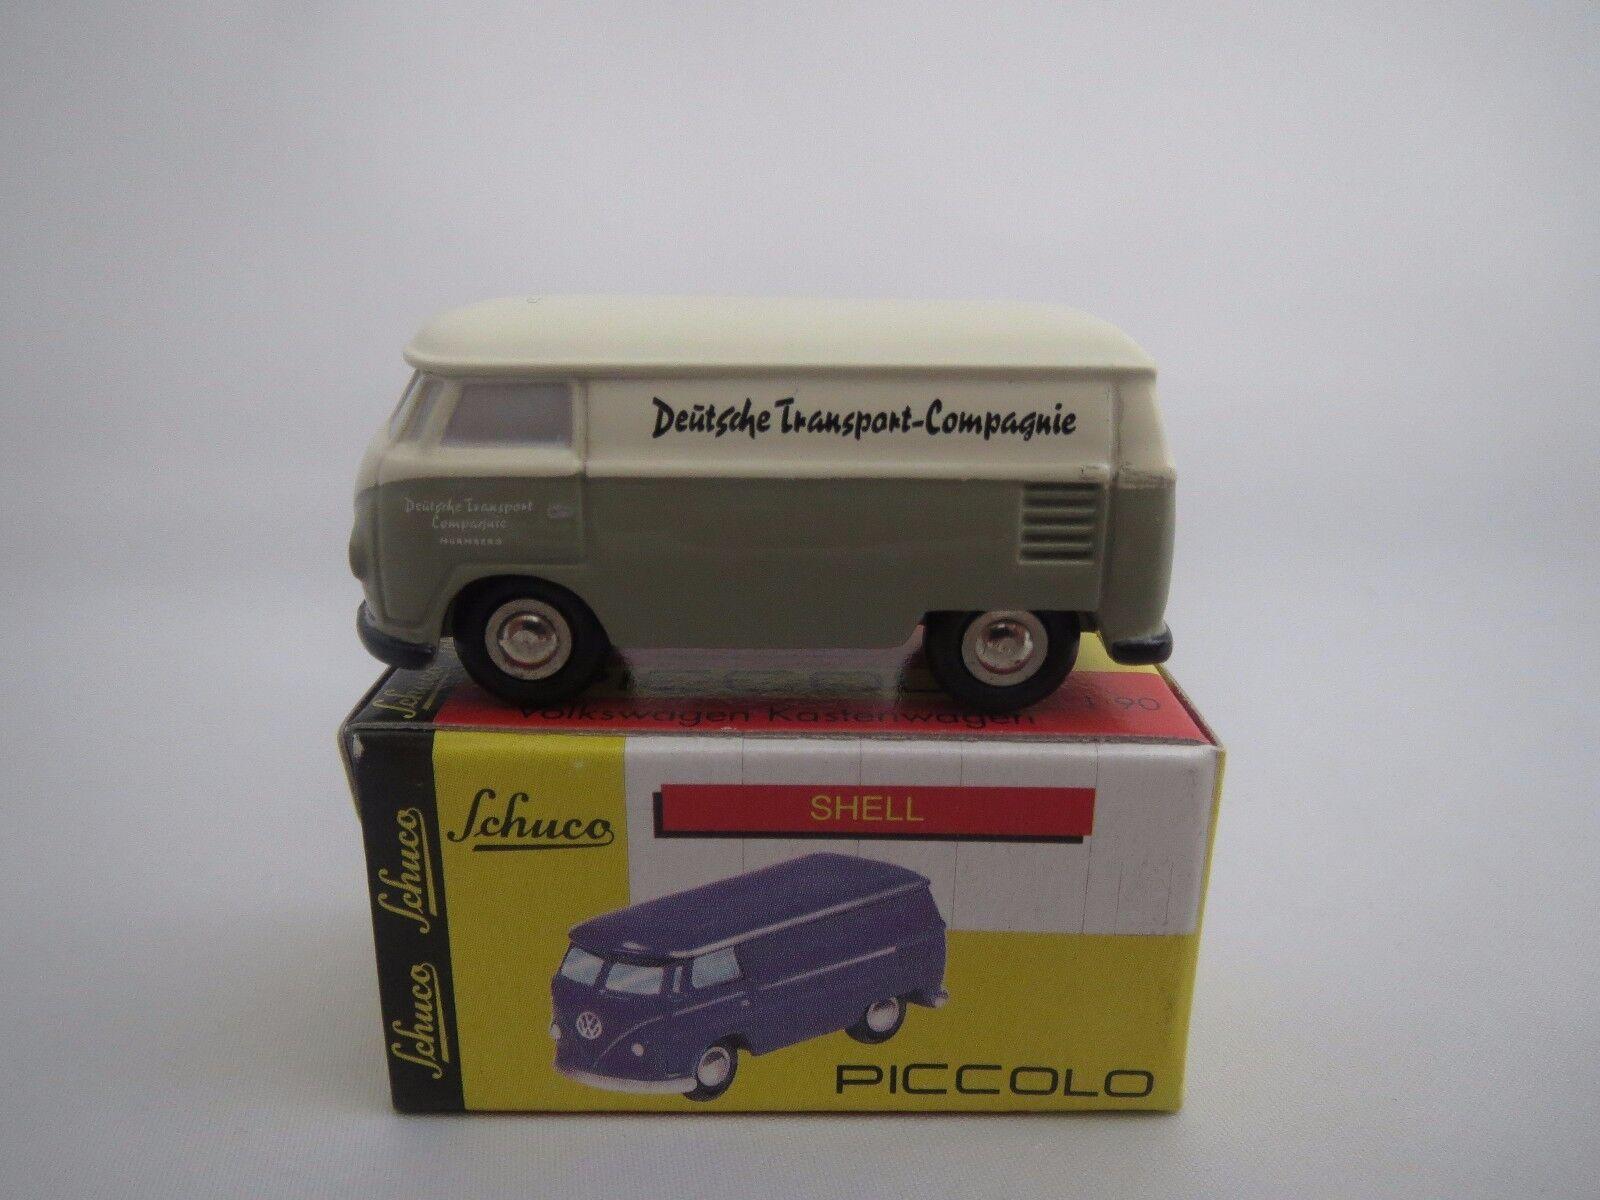 Schuco Piccolo Volkswagen Camionnette  DEUTSCHE-Transport-Compagnie    1 90 neuf dans sa boîte cea211